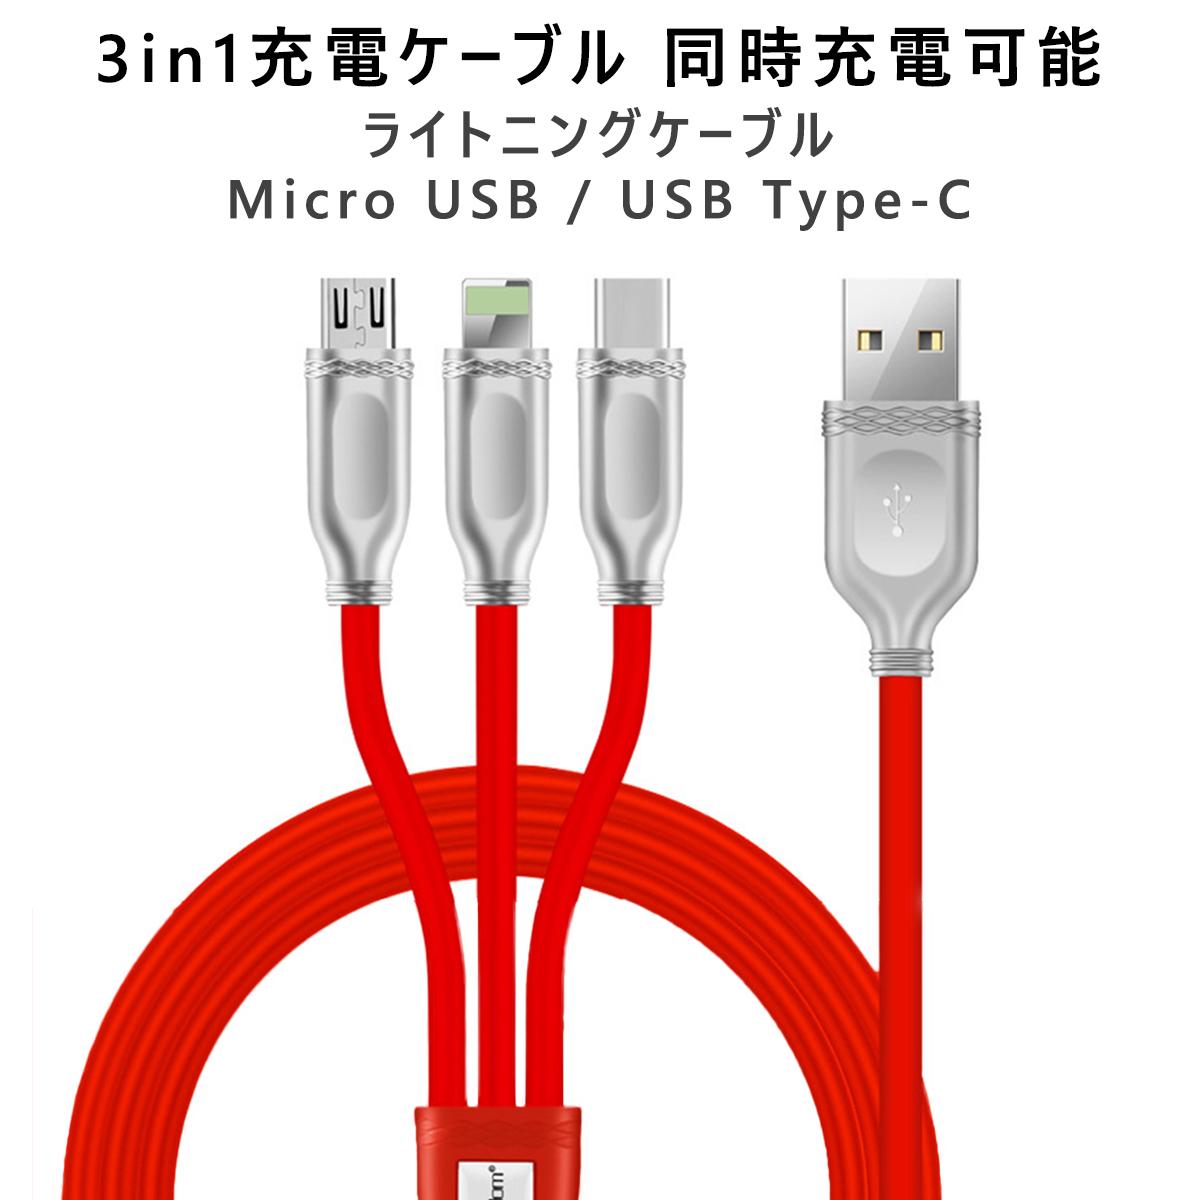 3in1 充電ケーブル 3A急速充電 充電専用 ライトニング ケーブル USB Type-C Micro USB ケーブル 同時給電可能 iPhone iPad Galaxy Xperia XZ 1本3役 多機種対応 高耐久性 1.2m レッド SDM便送料無料 1ヶ月保証 K&M